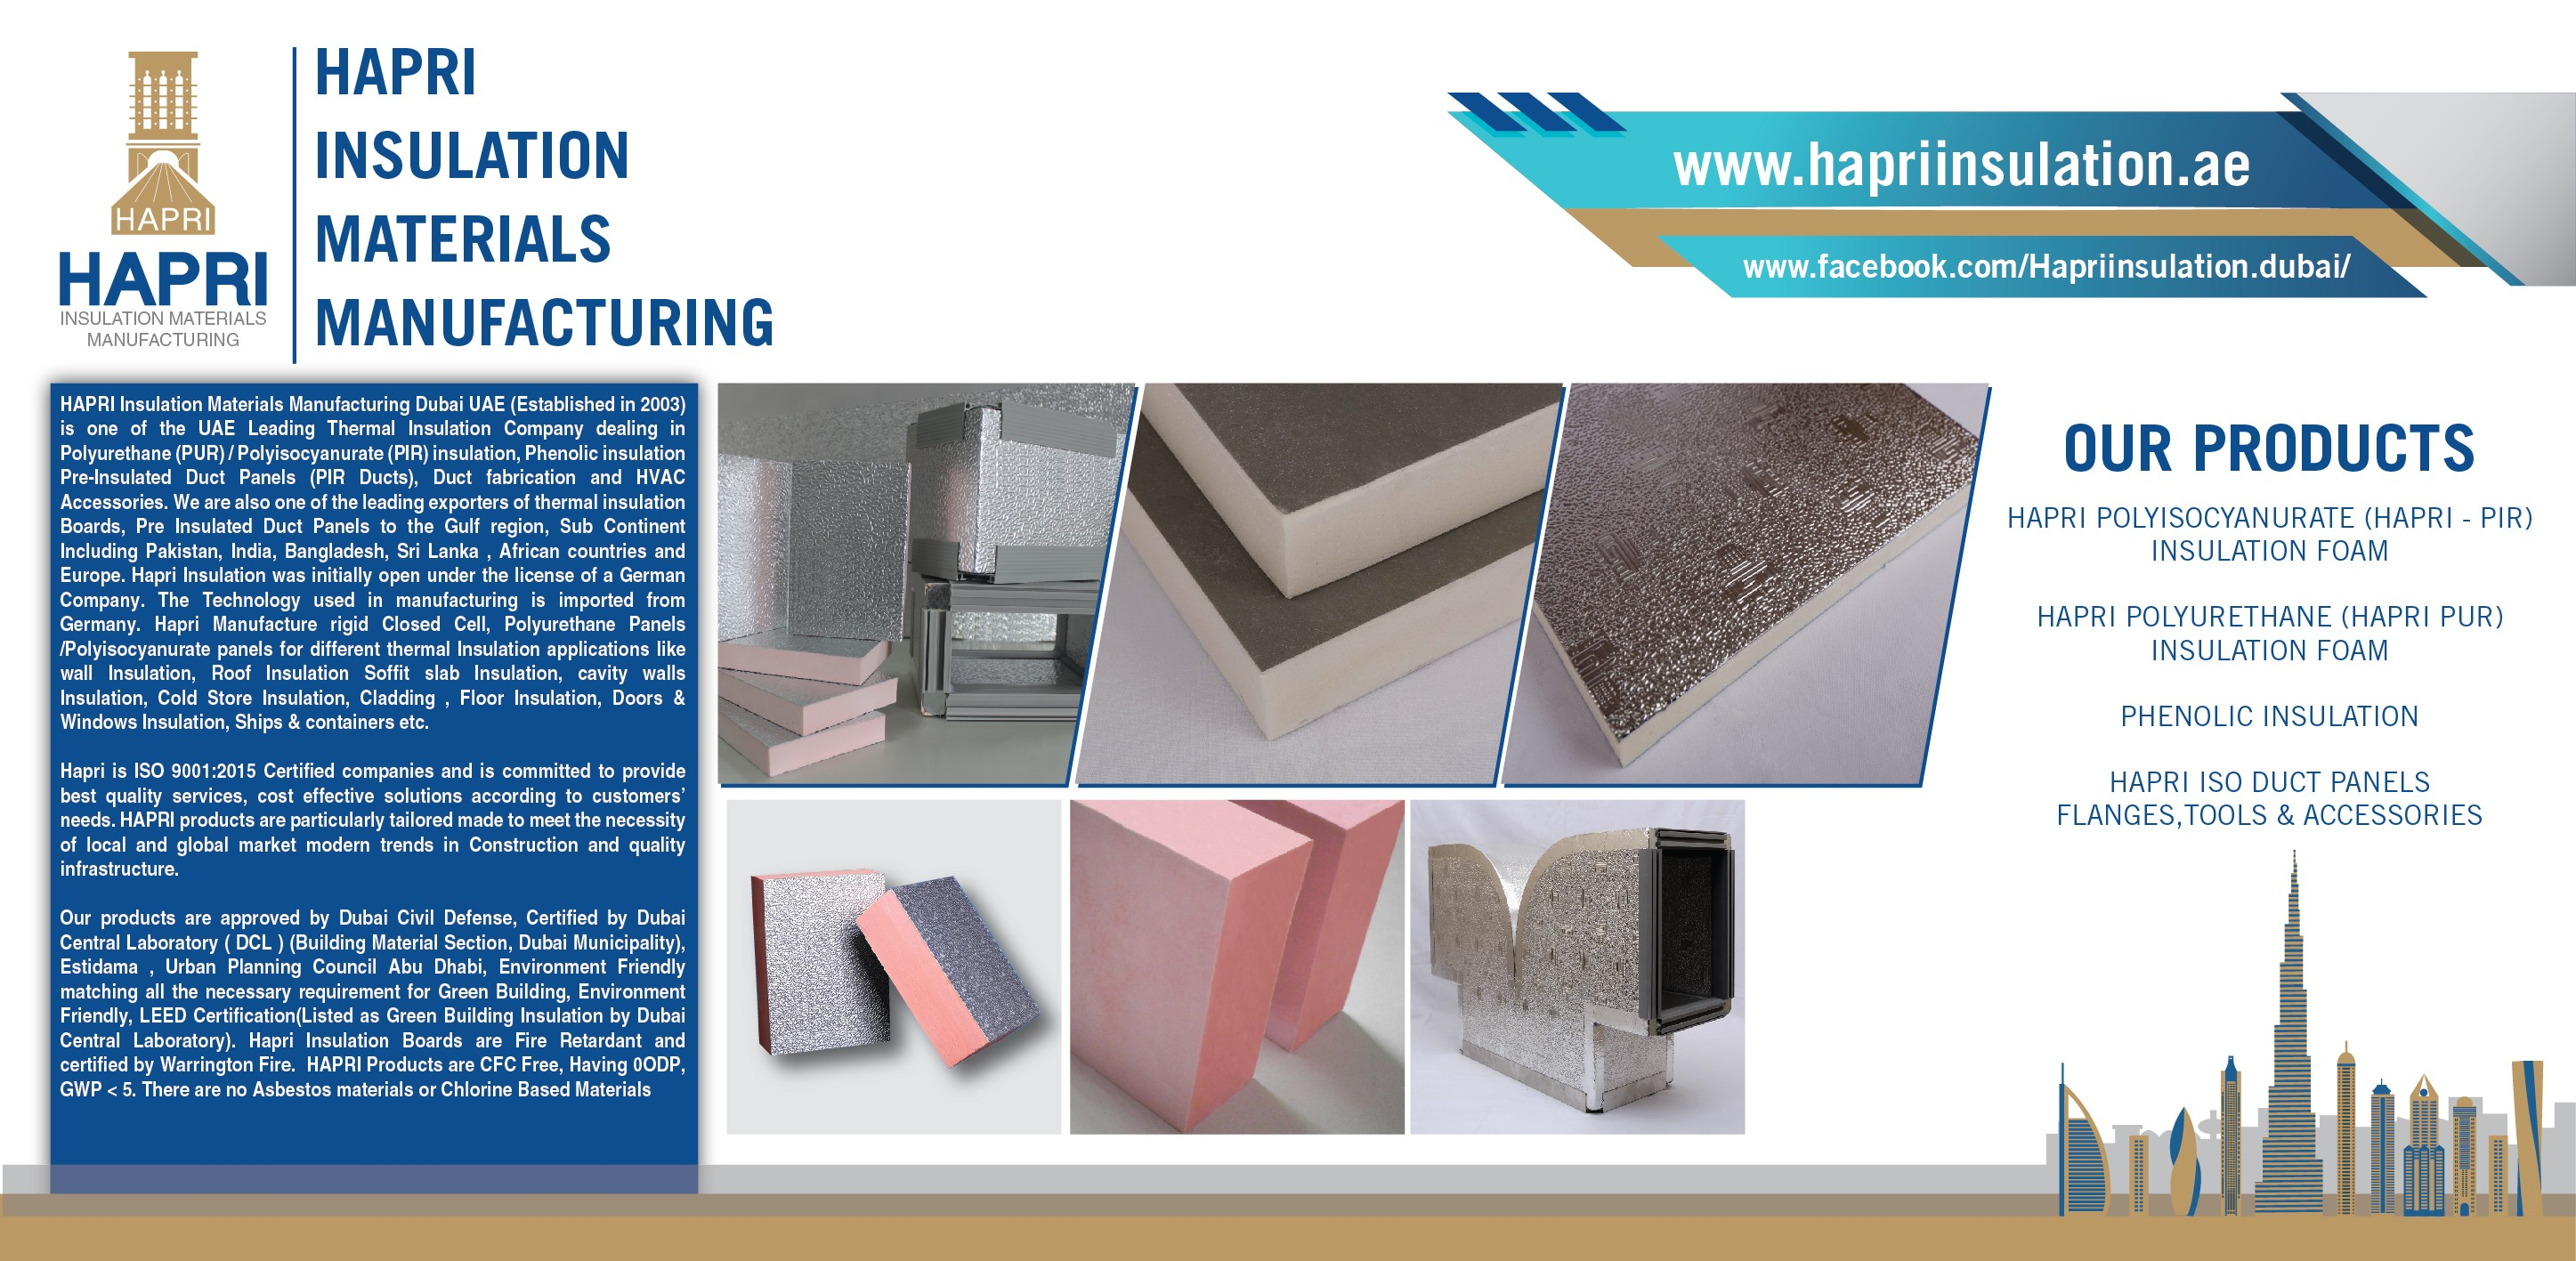 Hapri Insulation Materials Manufacturing | LinkedIn